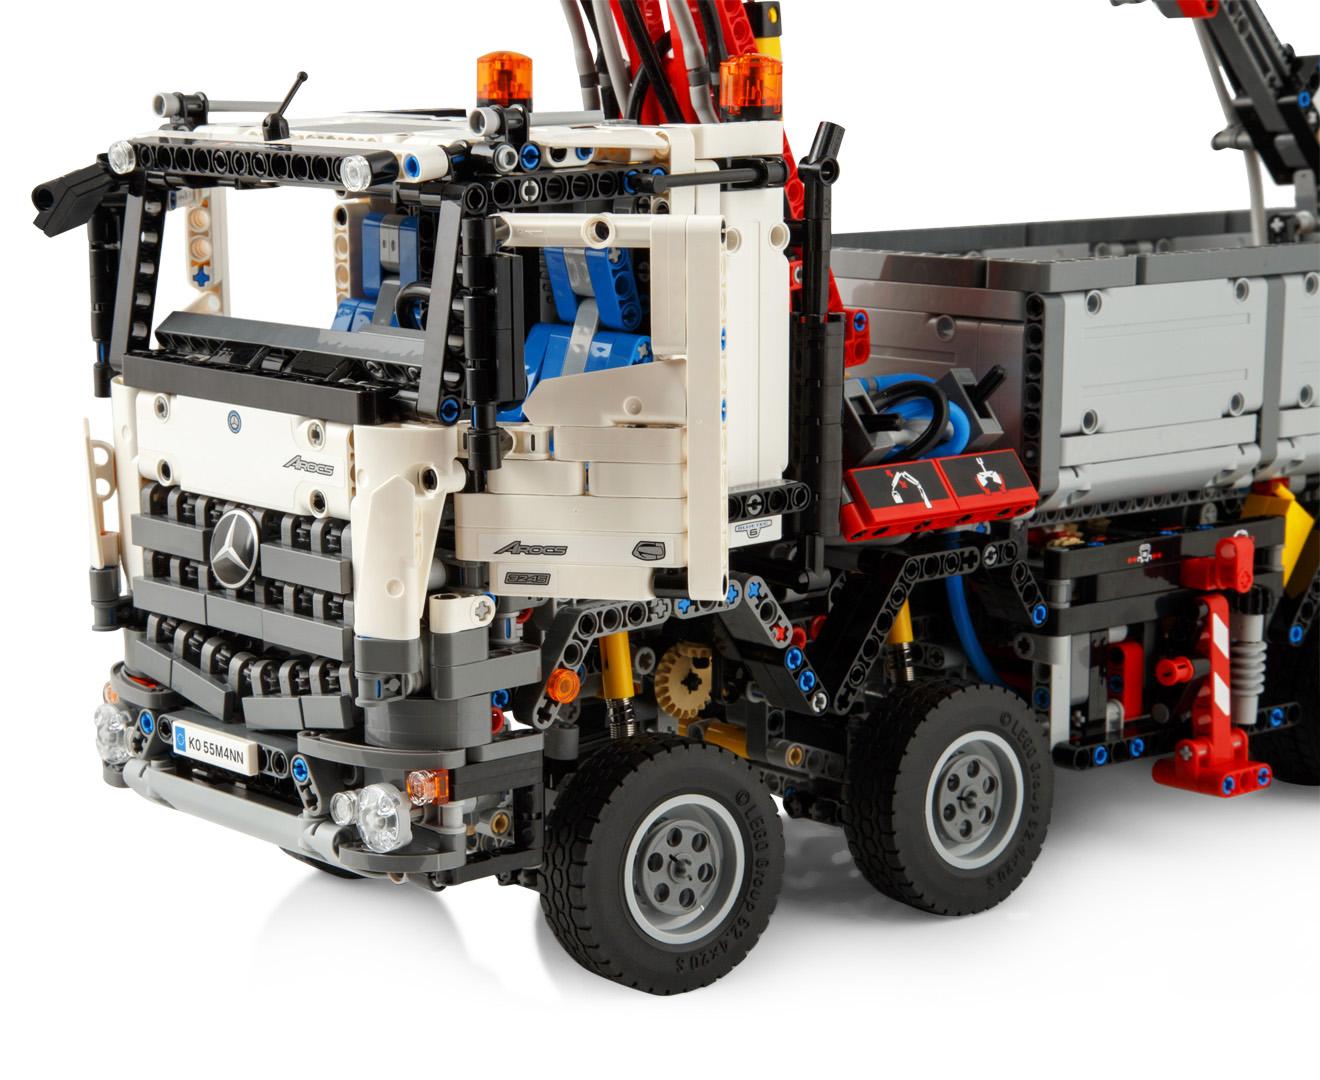 Lego technic mercedes benz arocs 3245 building set for Lego technic mercedes benz arocs